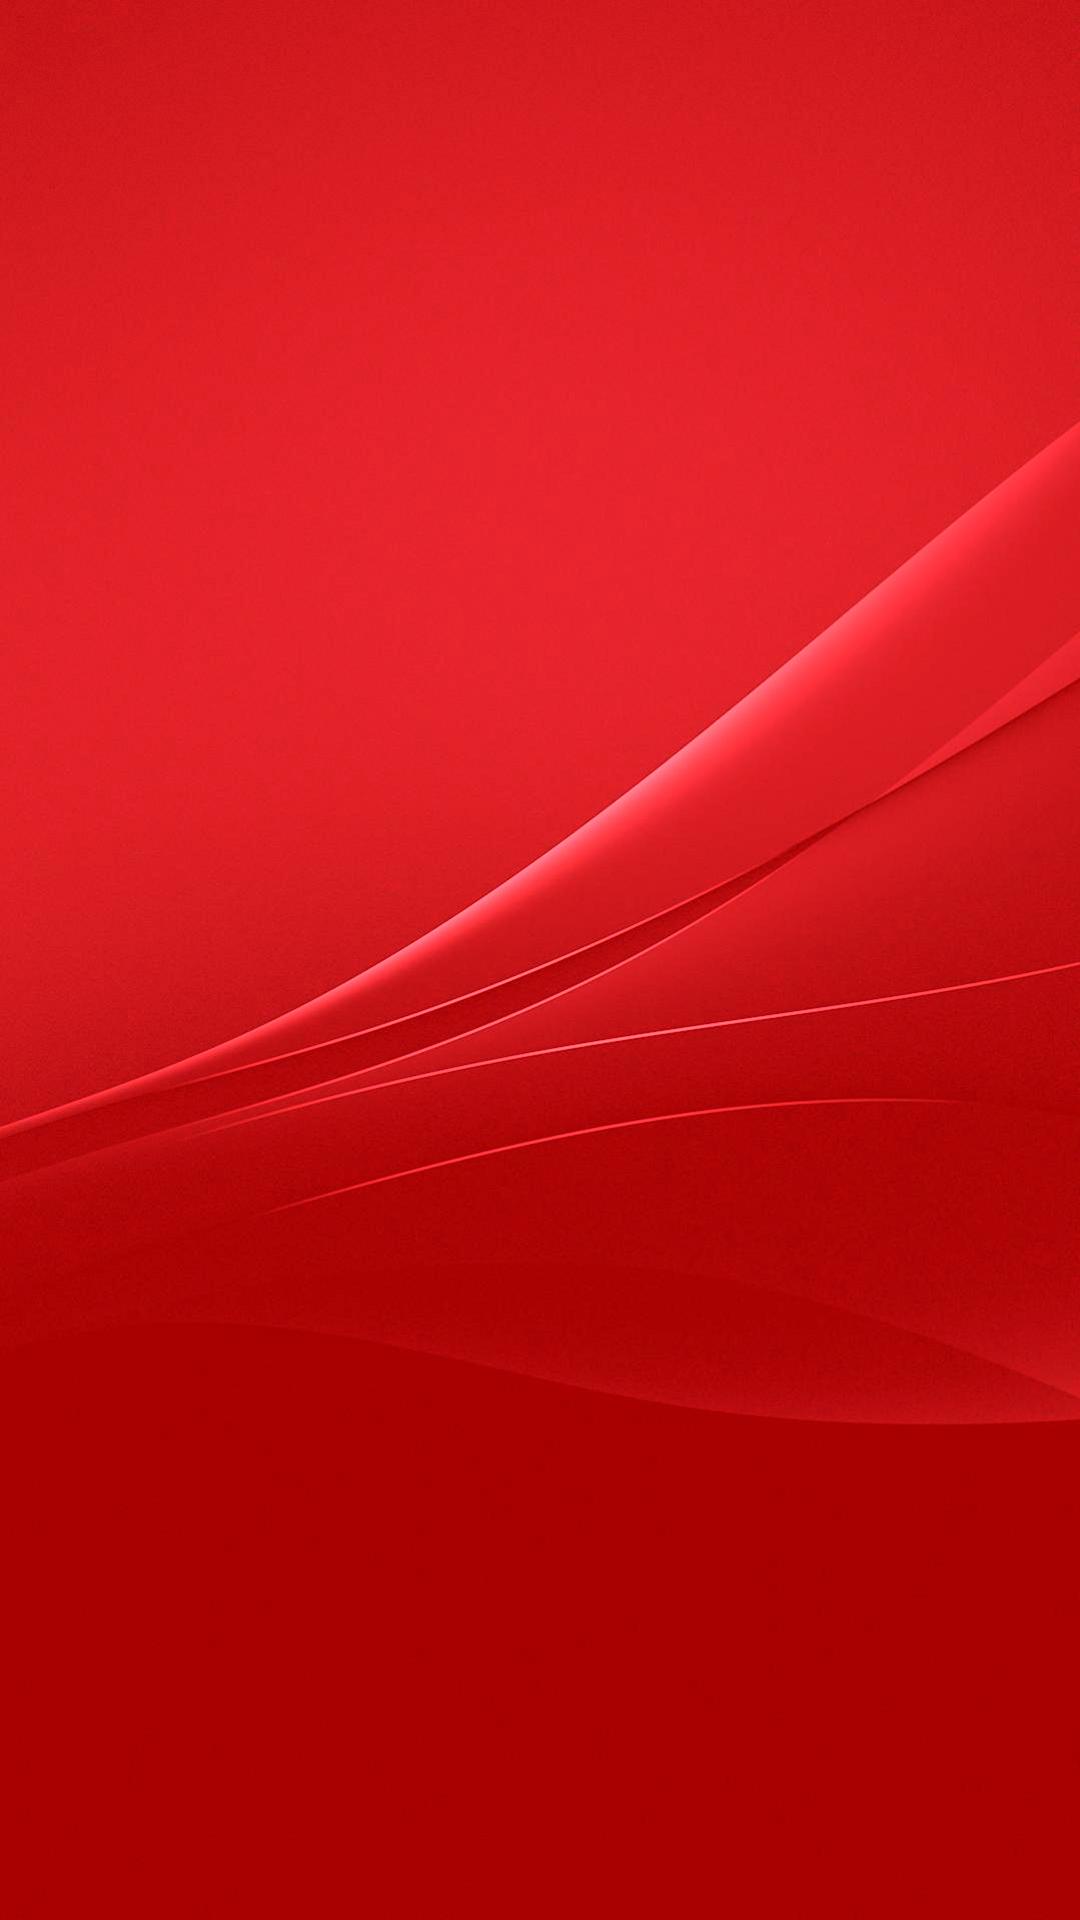 Hd wallpaper xperia z3 - Red Xperia Lollipop Experience Flow Wallpaper